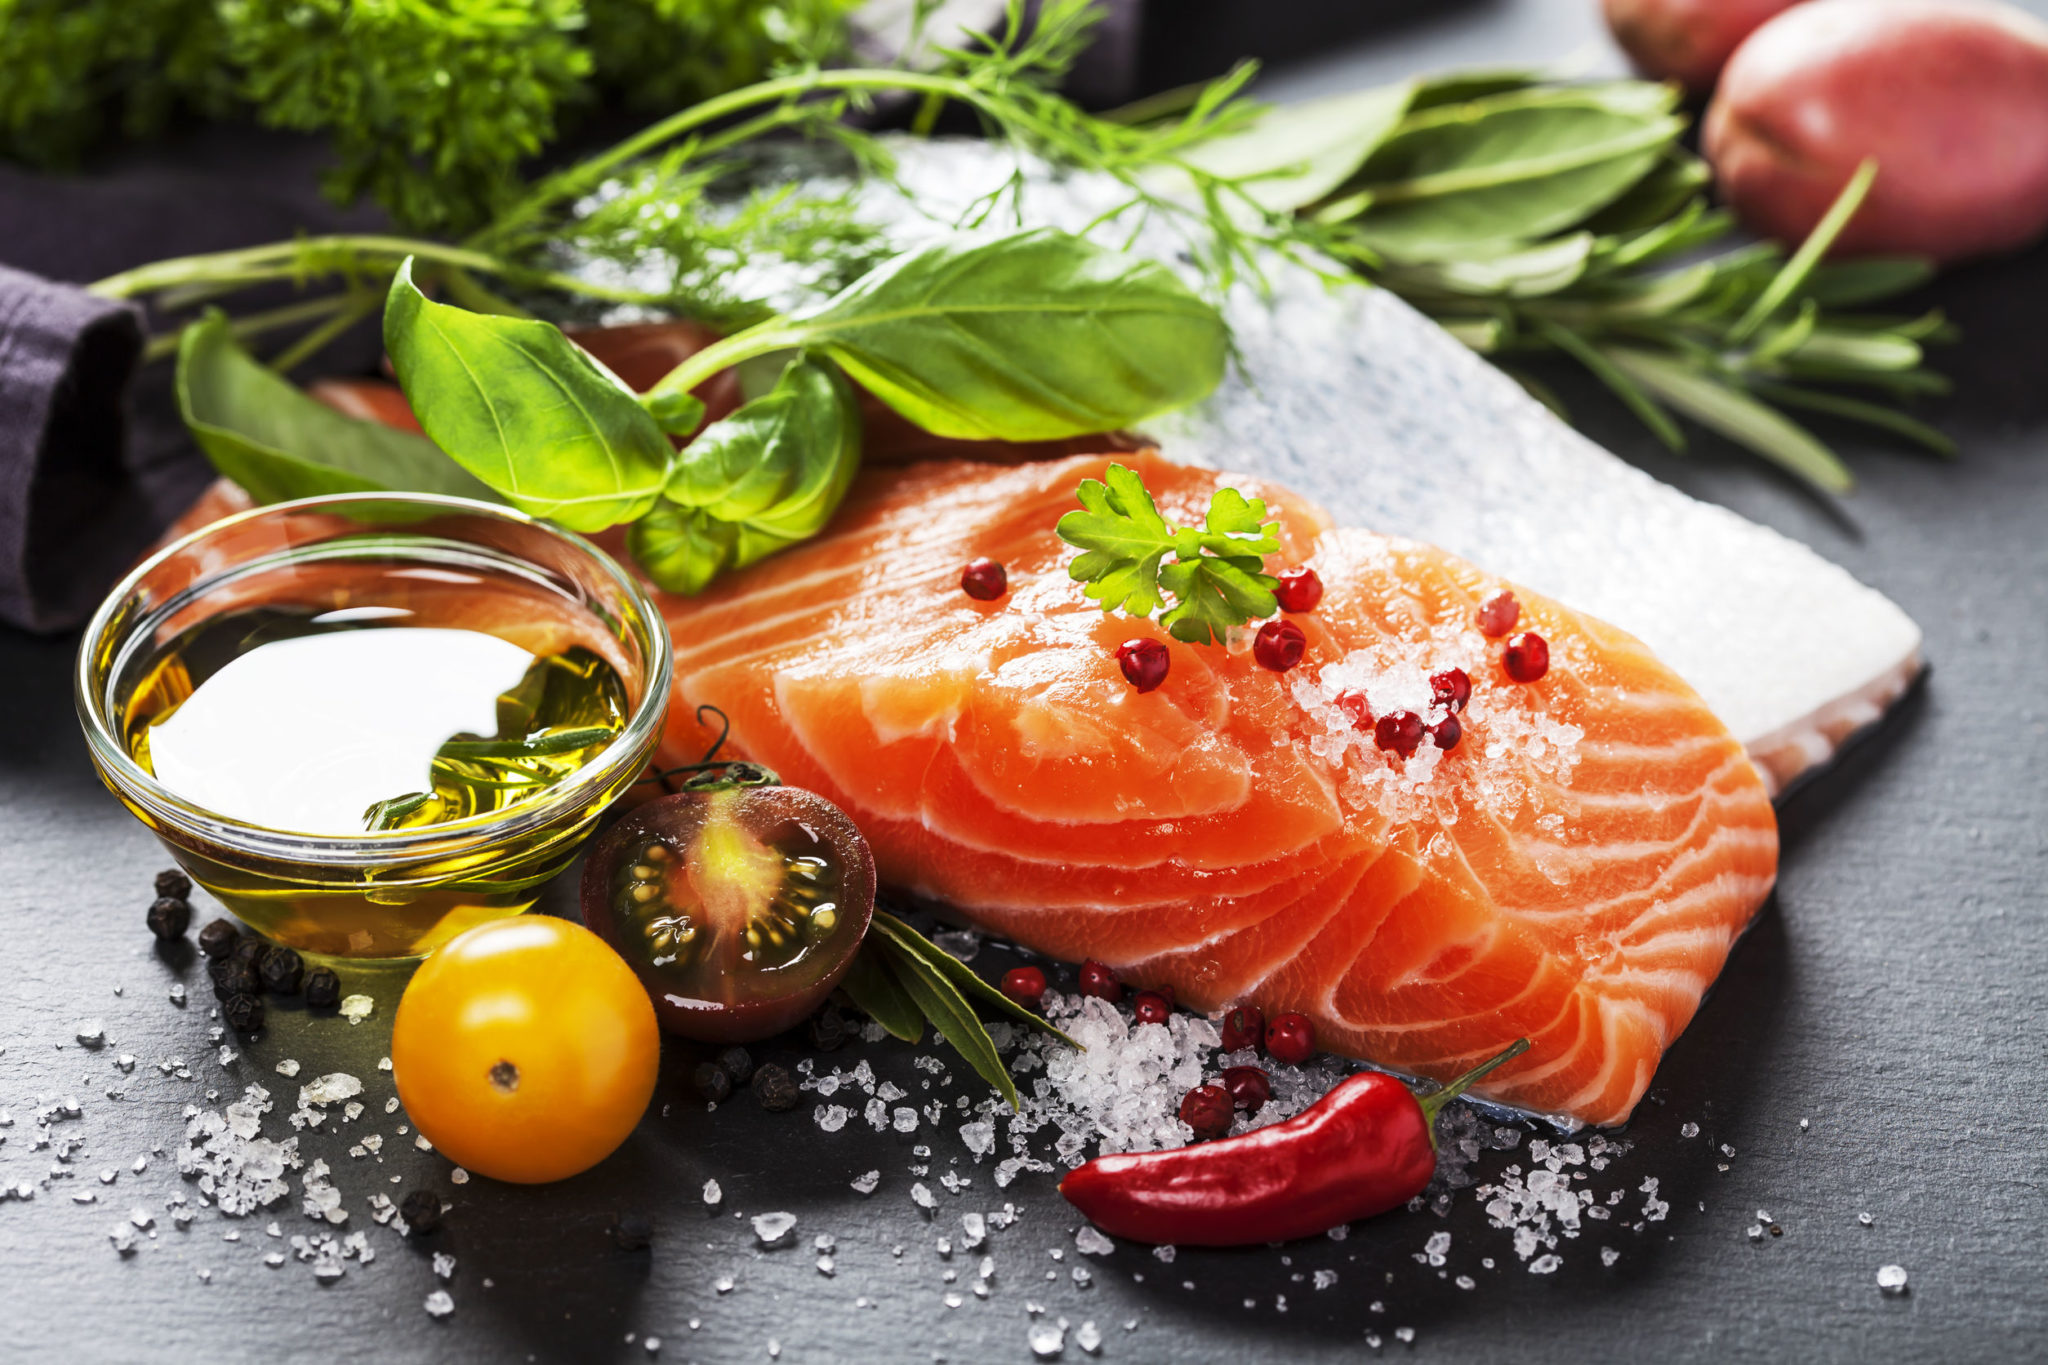 Taratata Brasserie - Salmon